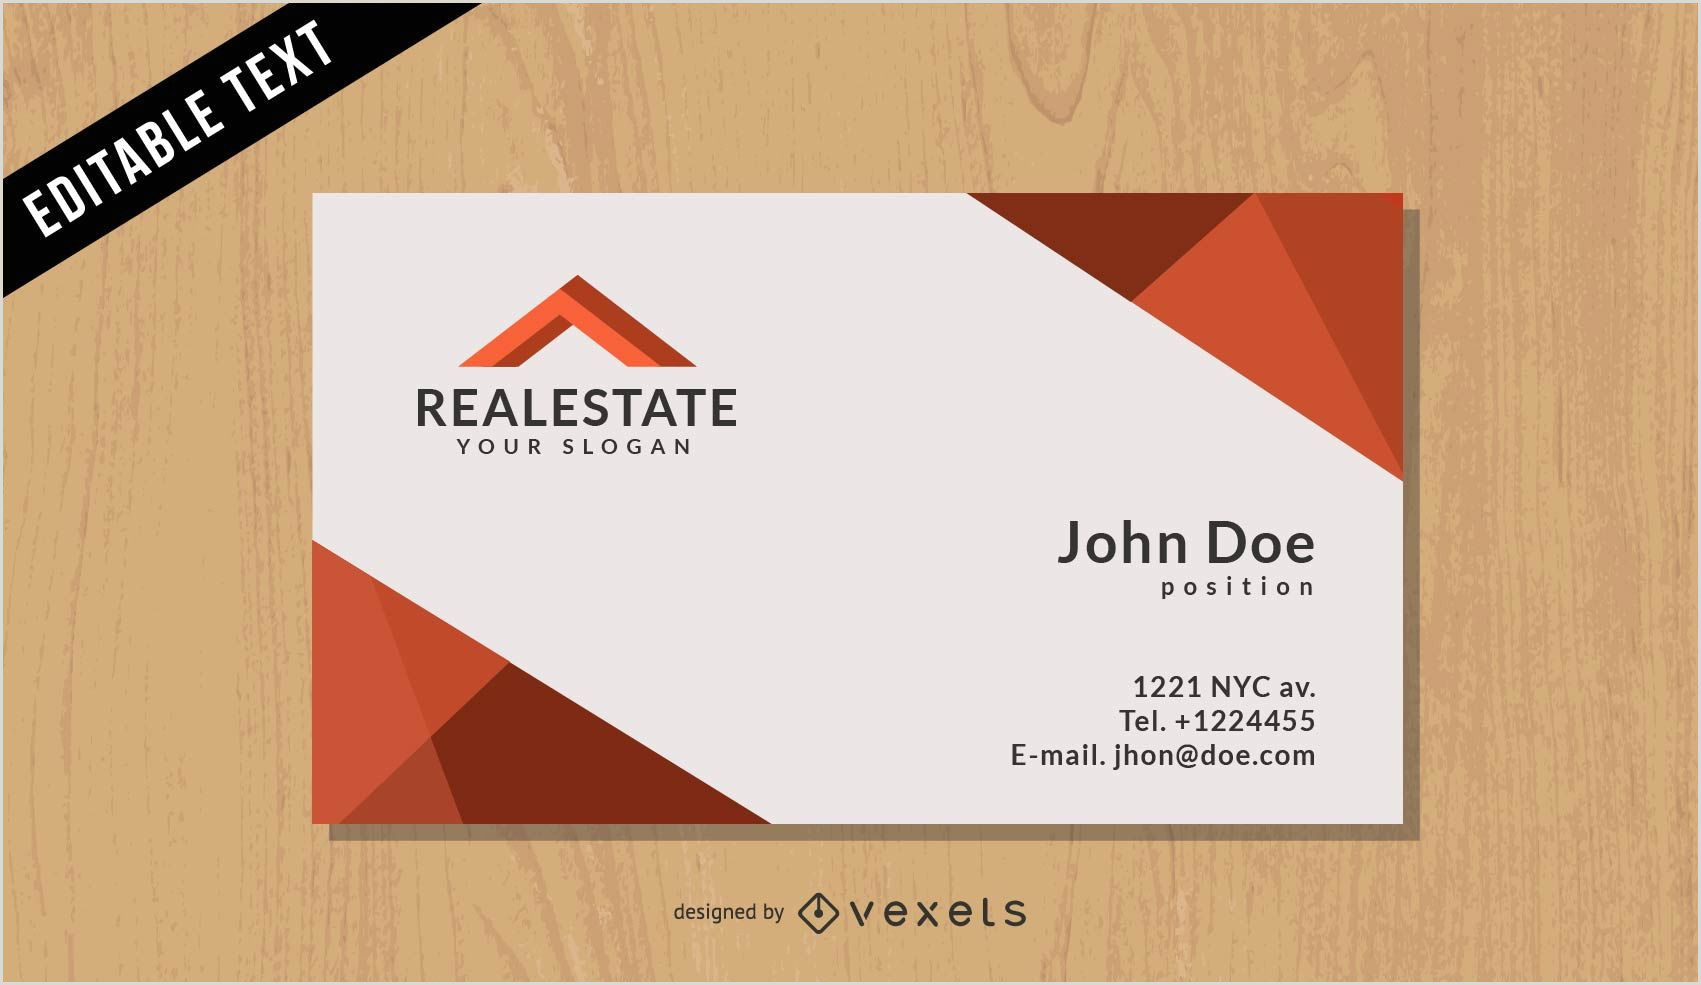 Unique Black White And Red Real Estate Business Cards Real Estate Black Business Card Vector Download